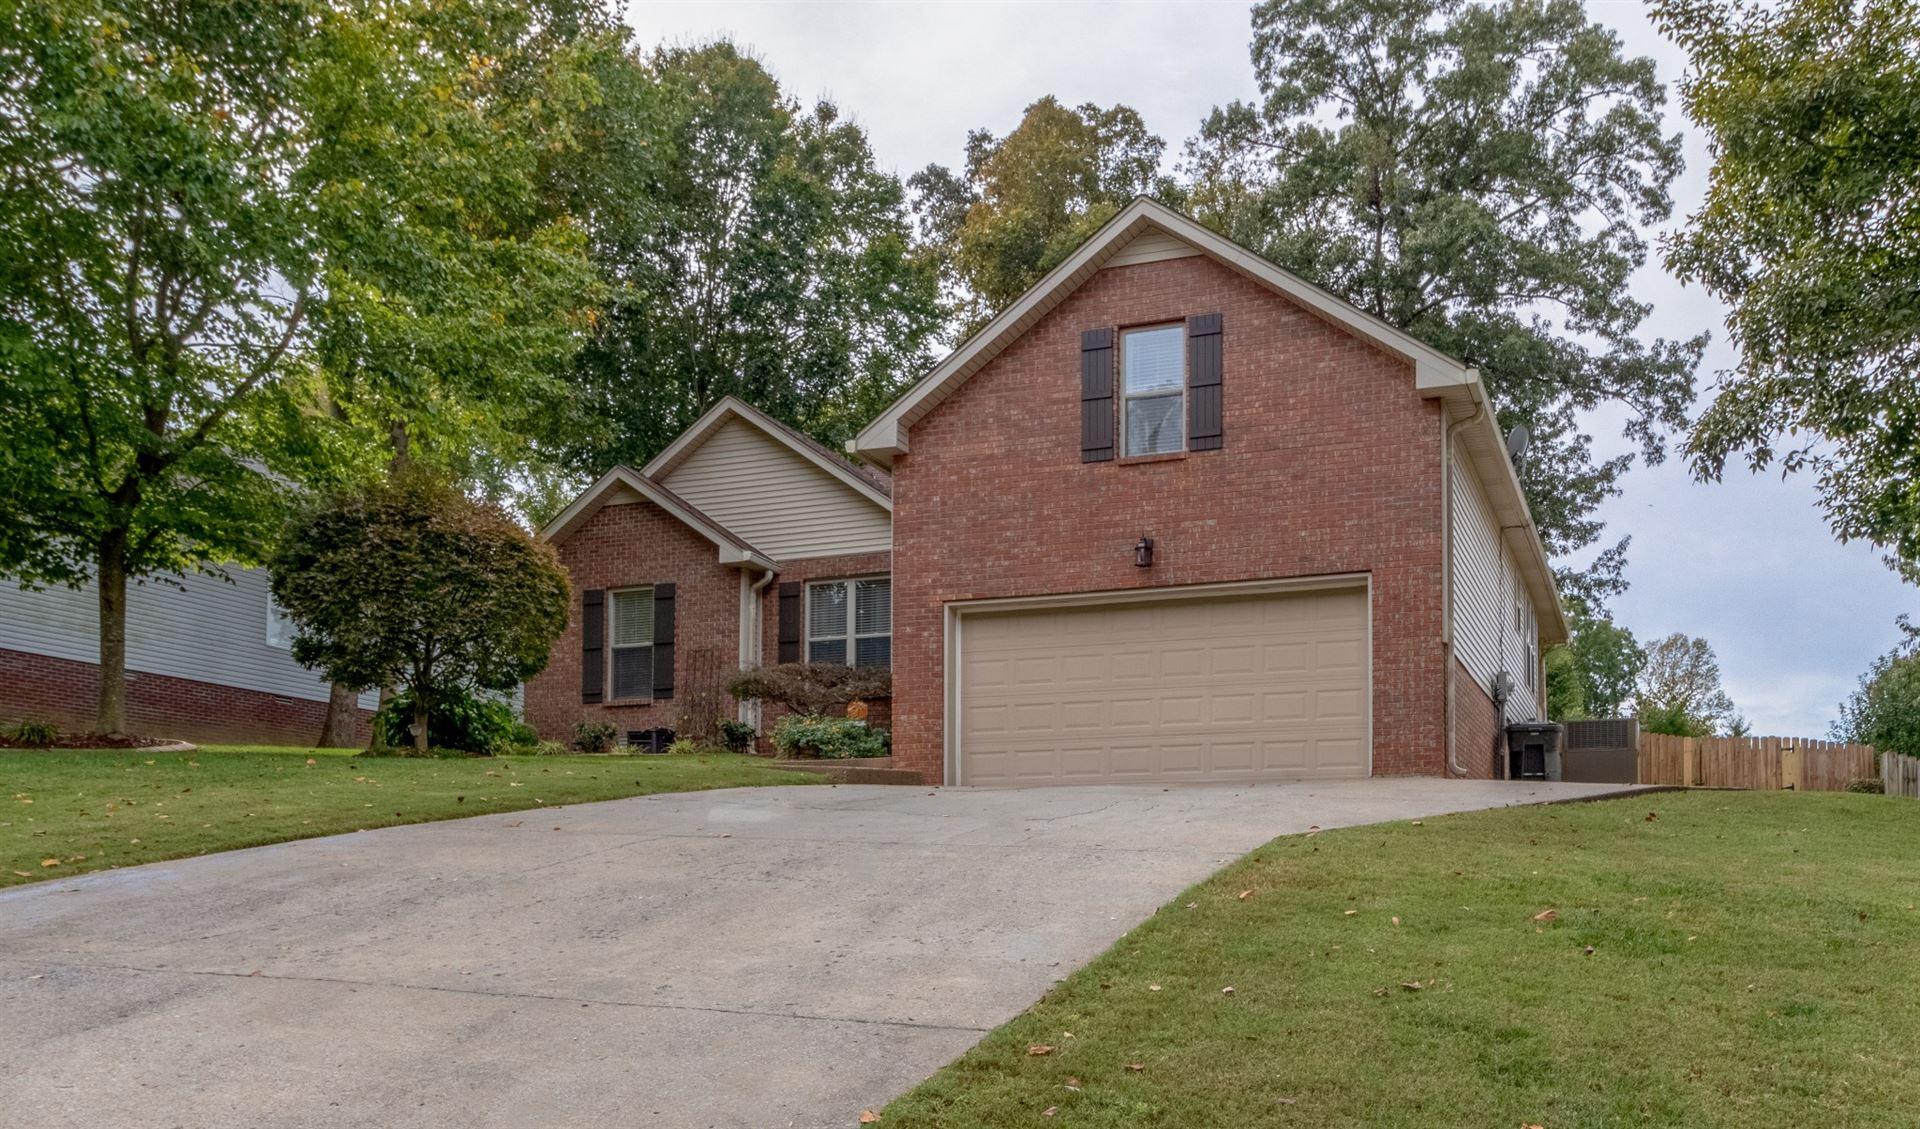 1650 Windriver Rd, Clarksville, TN 37042 - MLS#: 2301735